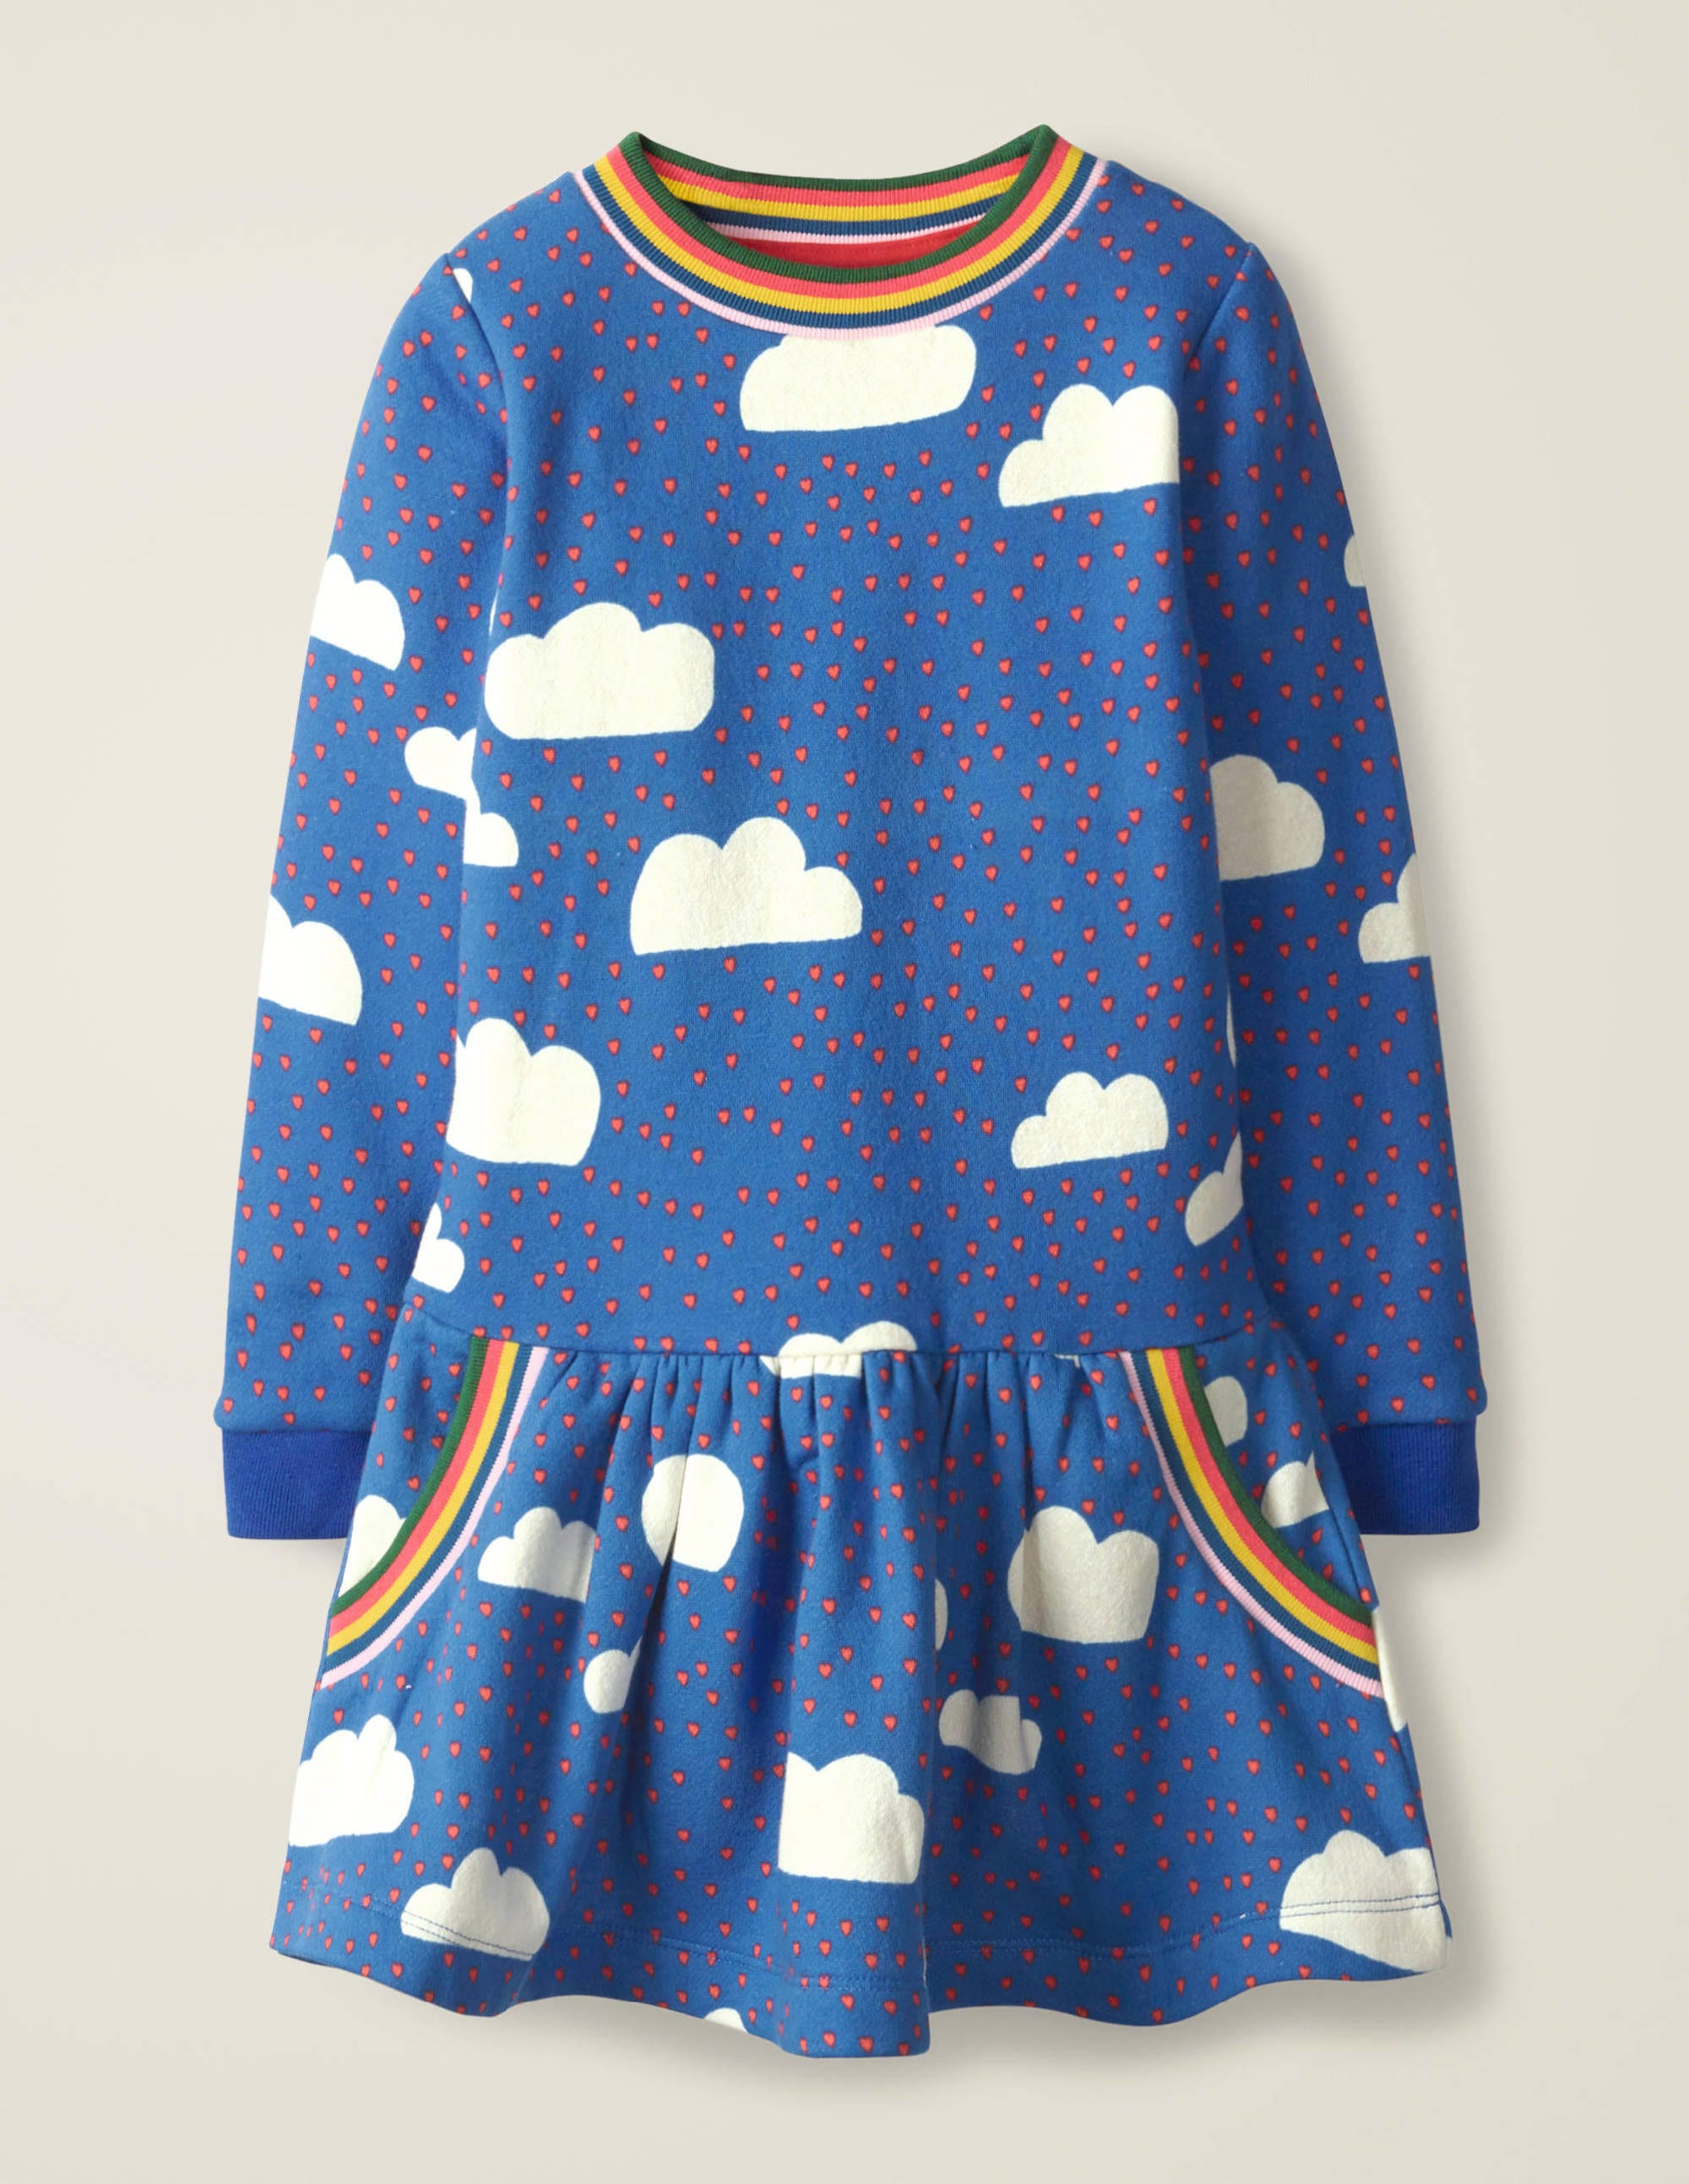 Boys Girls Vintage Belgium Flag Lovely Sweaters Soft Warm Childrens Sweater